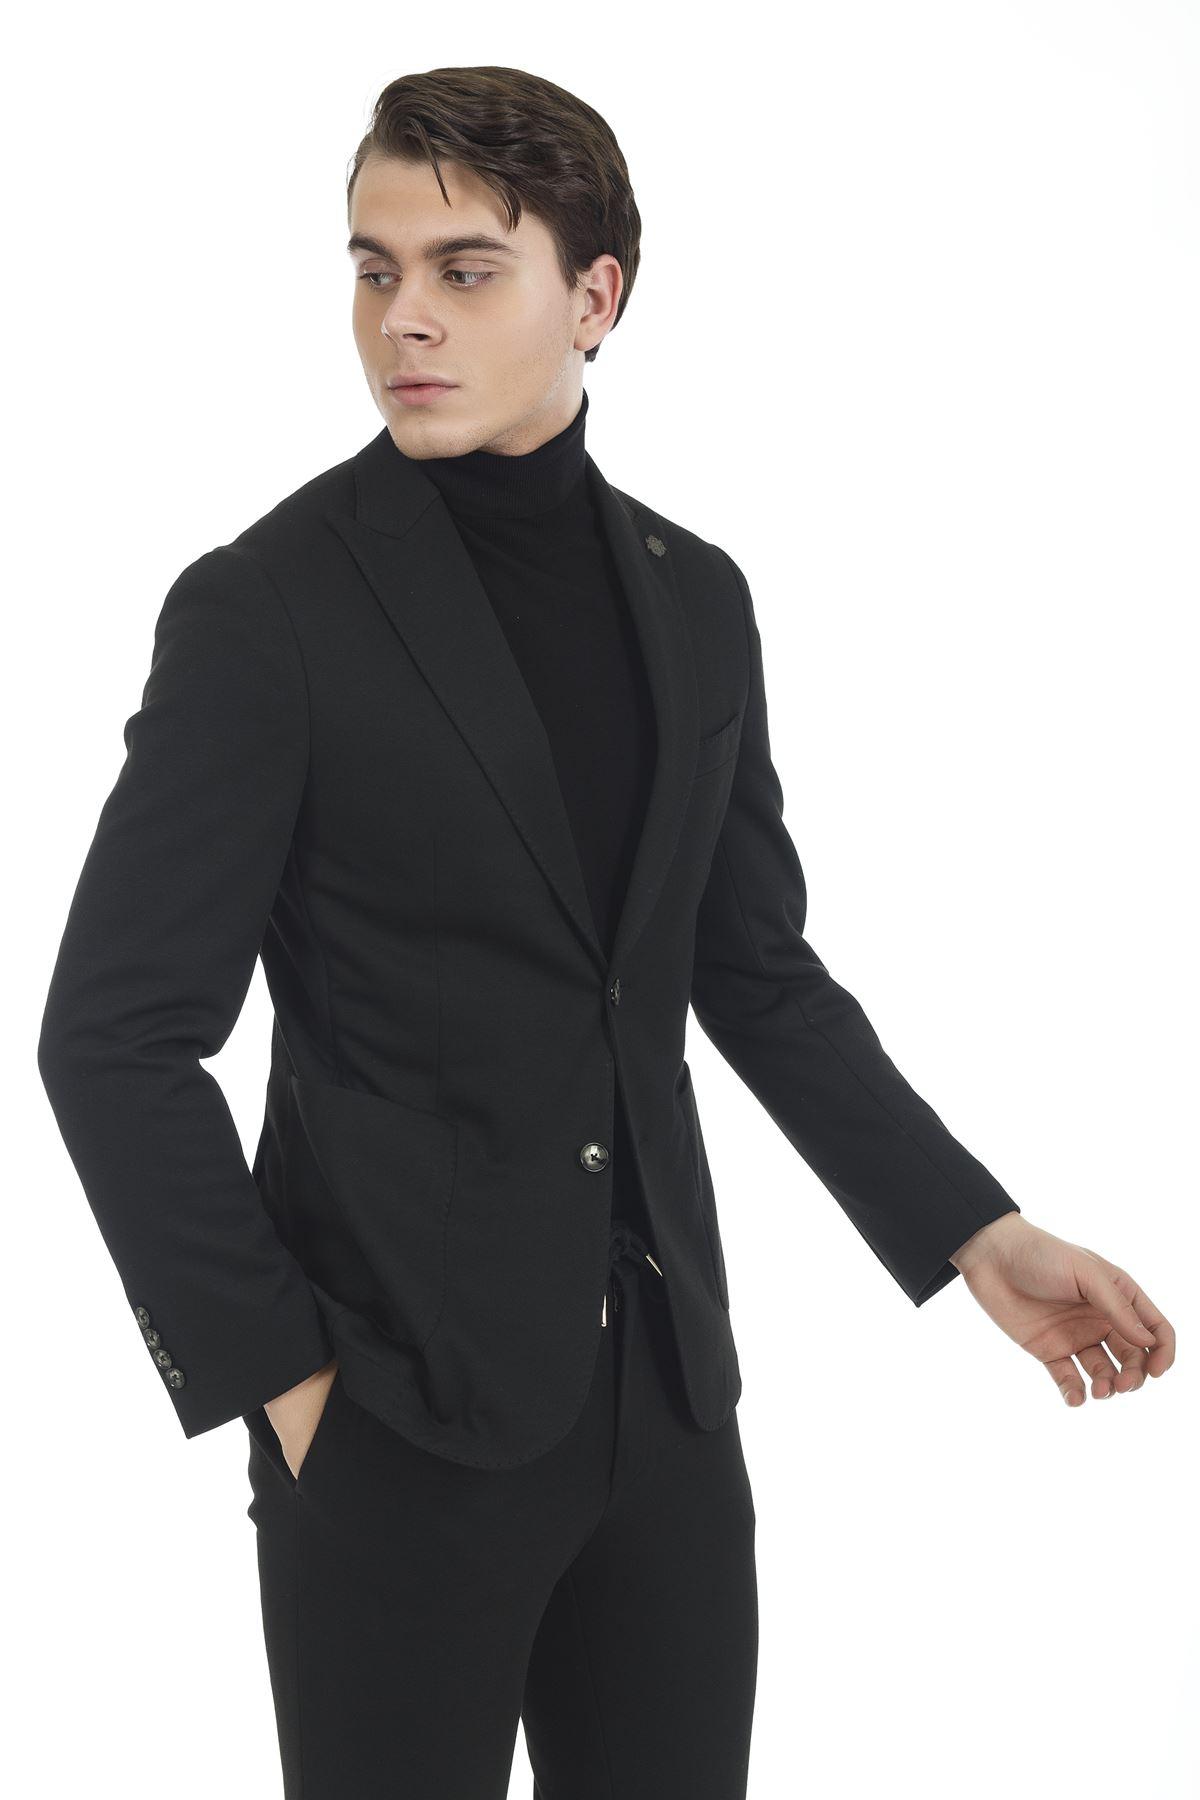 Siyah Süper Slim Takım Elbise